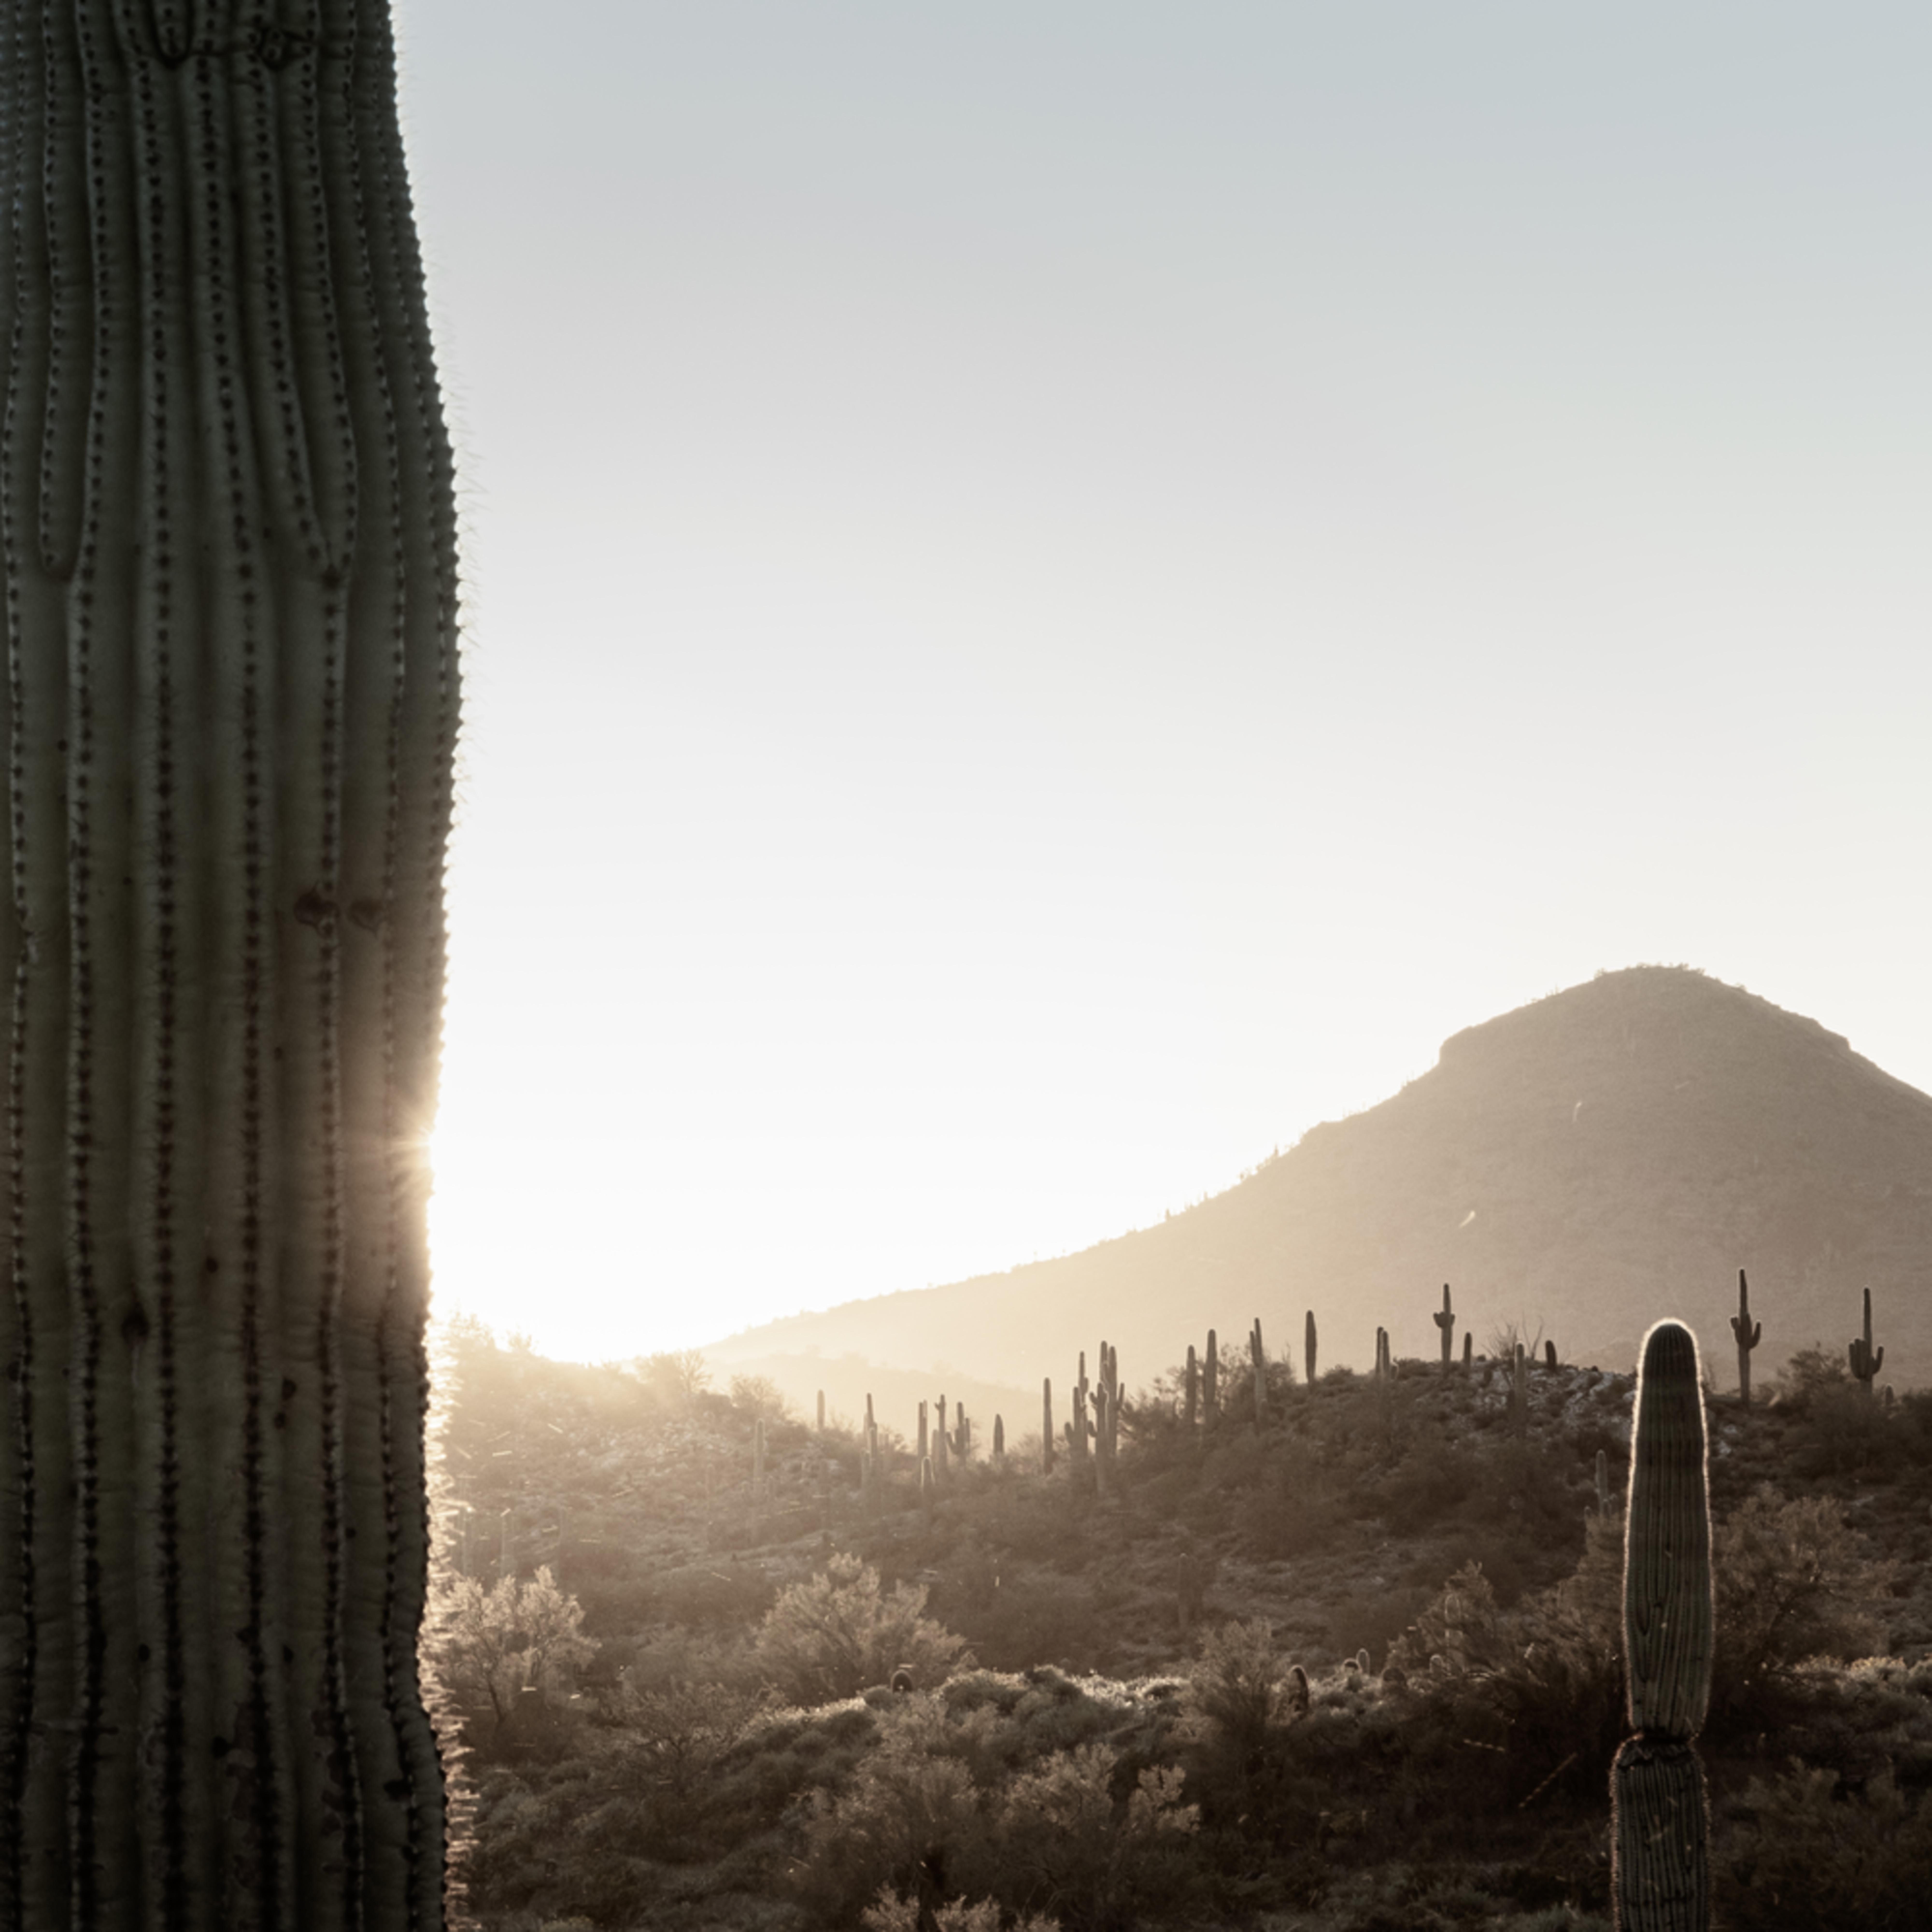 Sonoran desert gold 2 yovpoy